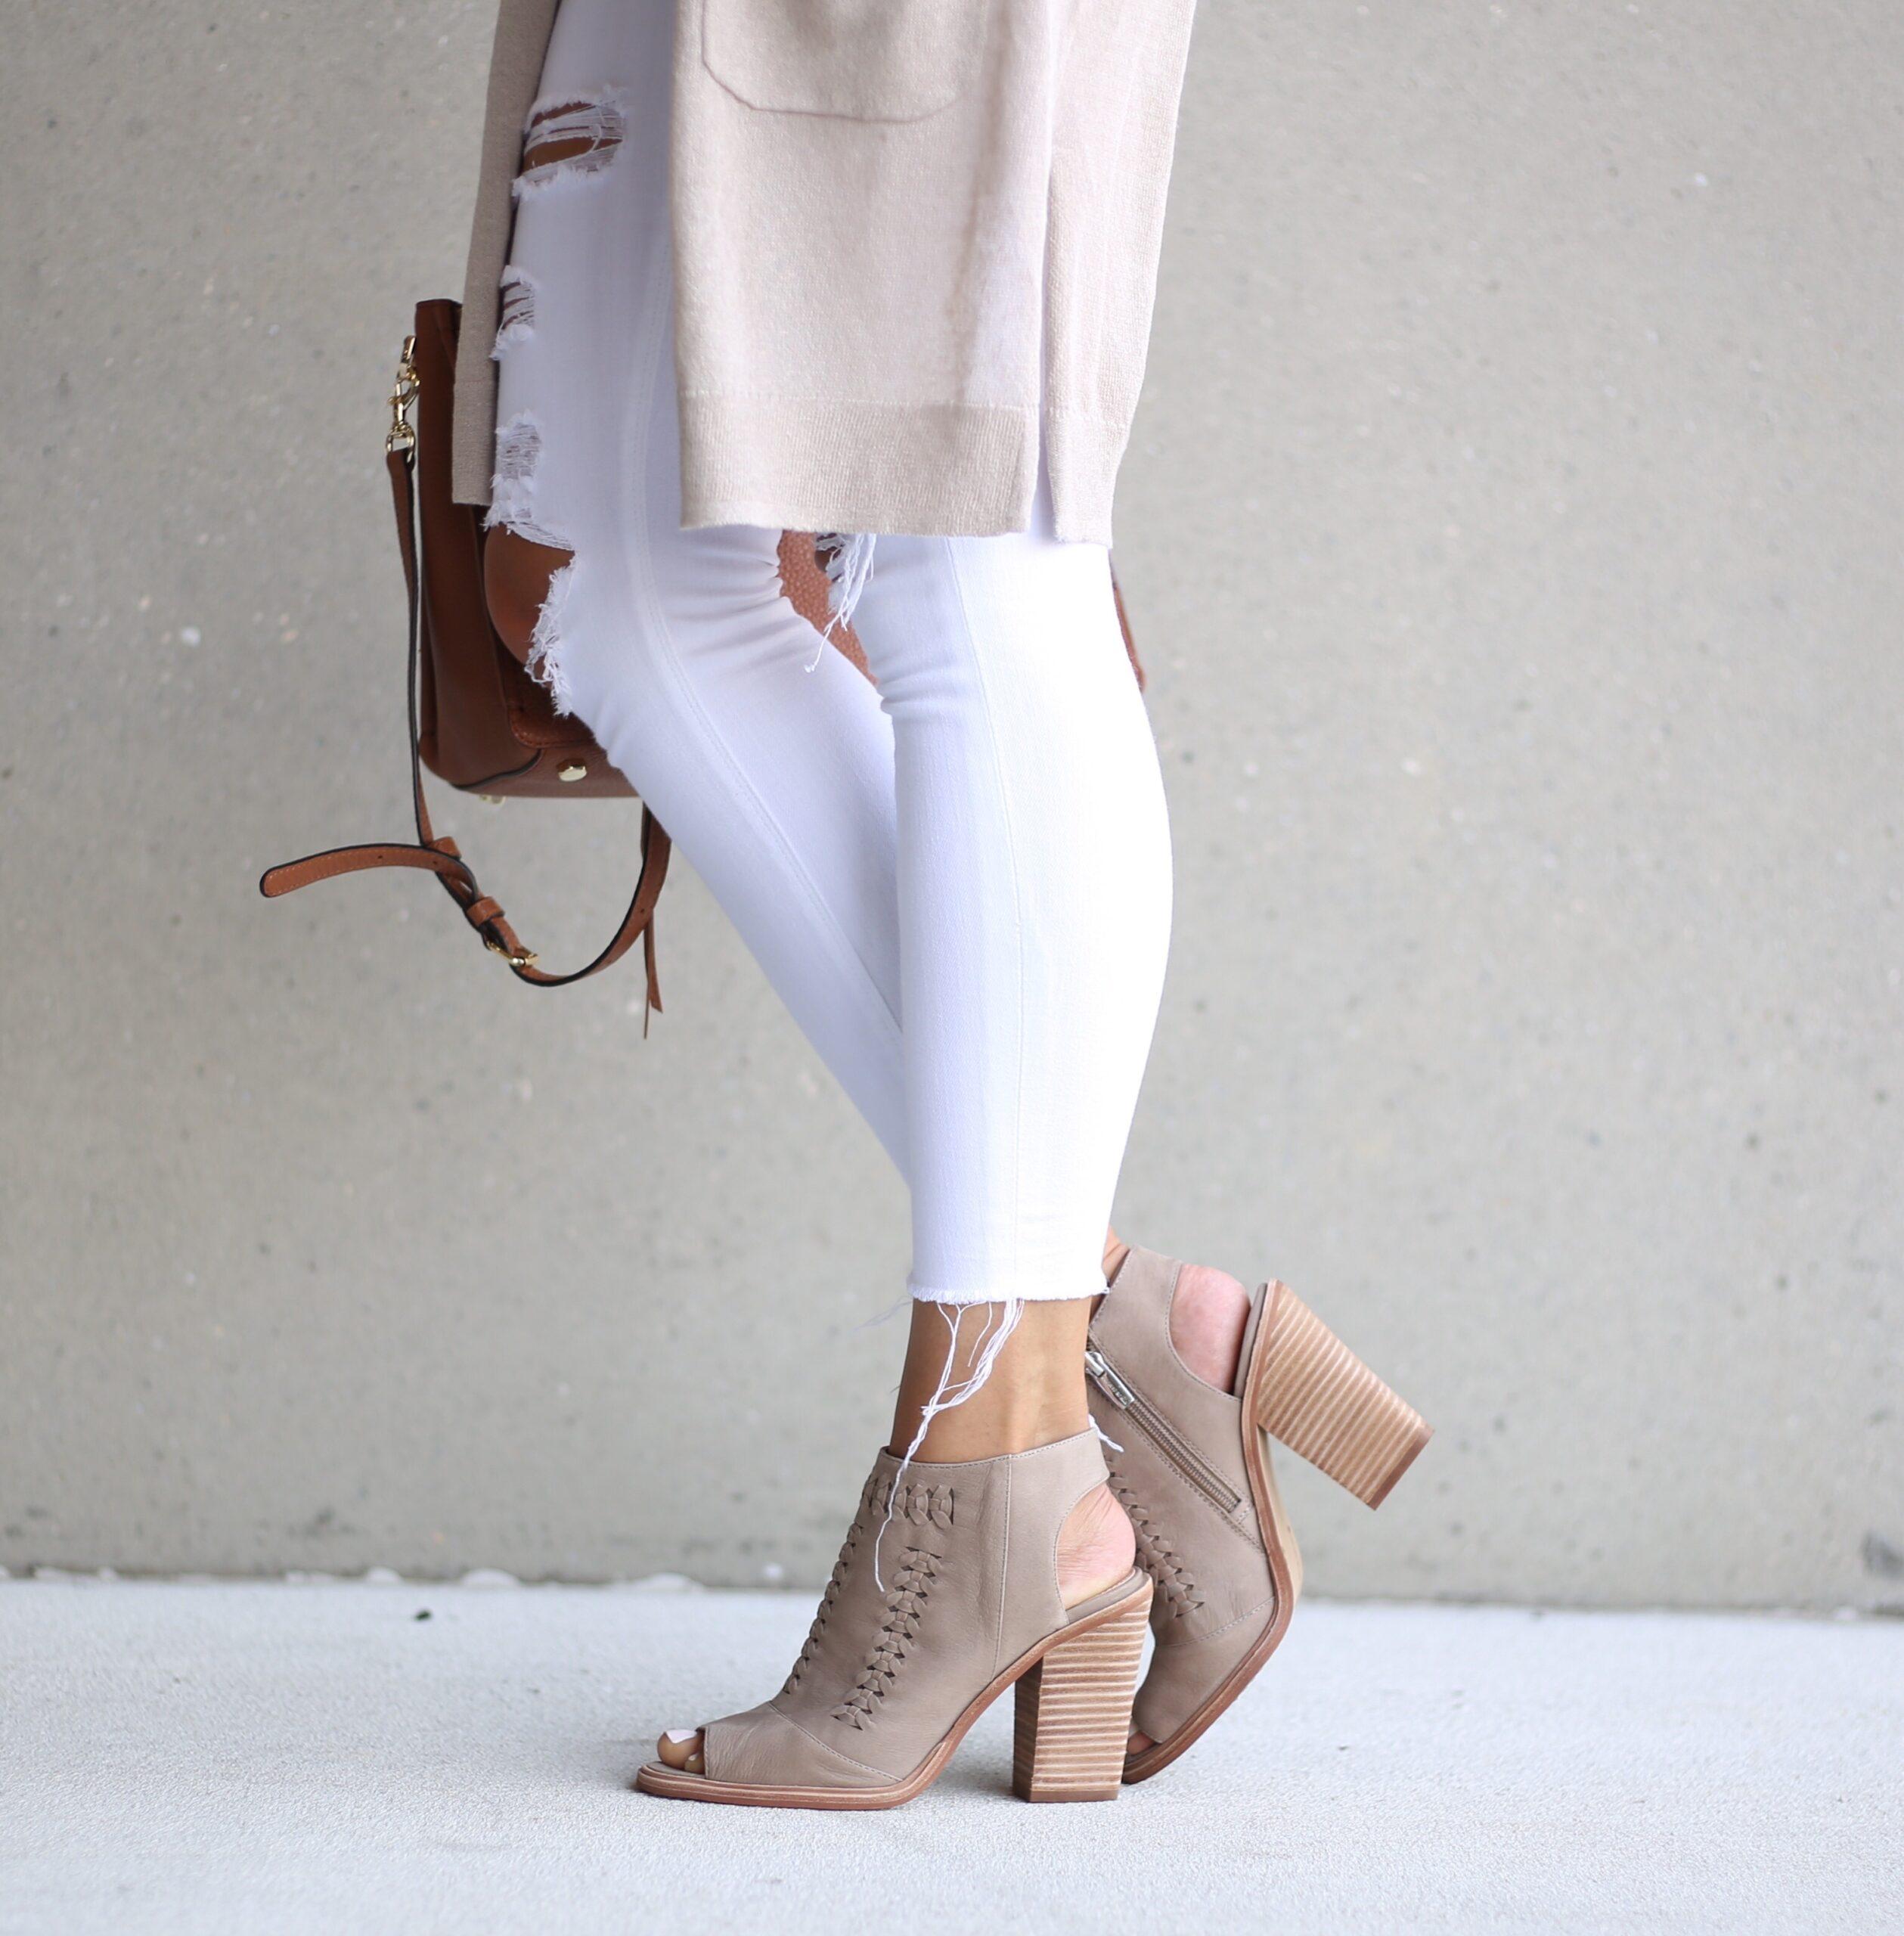 blogger Anna Monteiro of Blushing Rose Style wearing Vince Kamuto booties